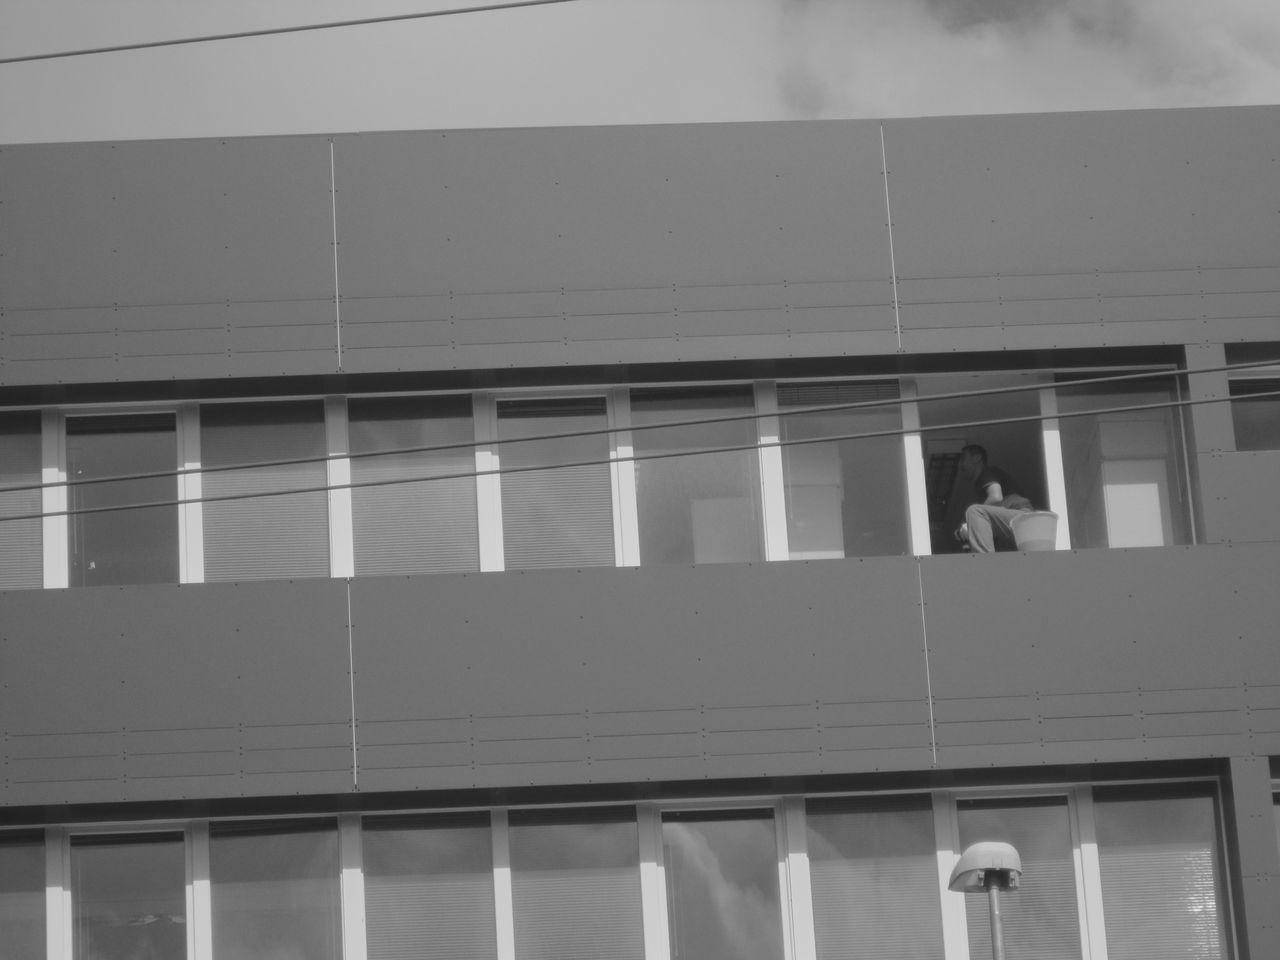 #basilicata #blackandwhite #fotobianconero #fotobianconero #bianco&nero #OldPicture #potenza #potenzainferiore #vialedelbasento #Walk